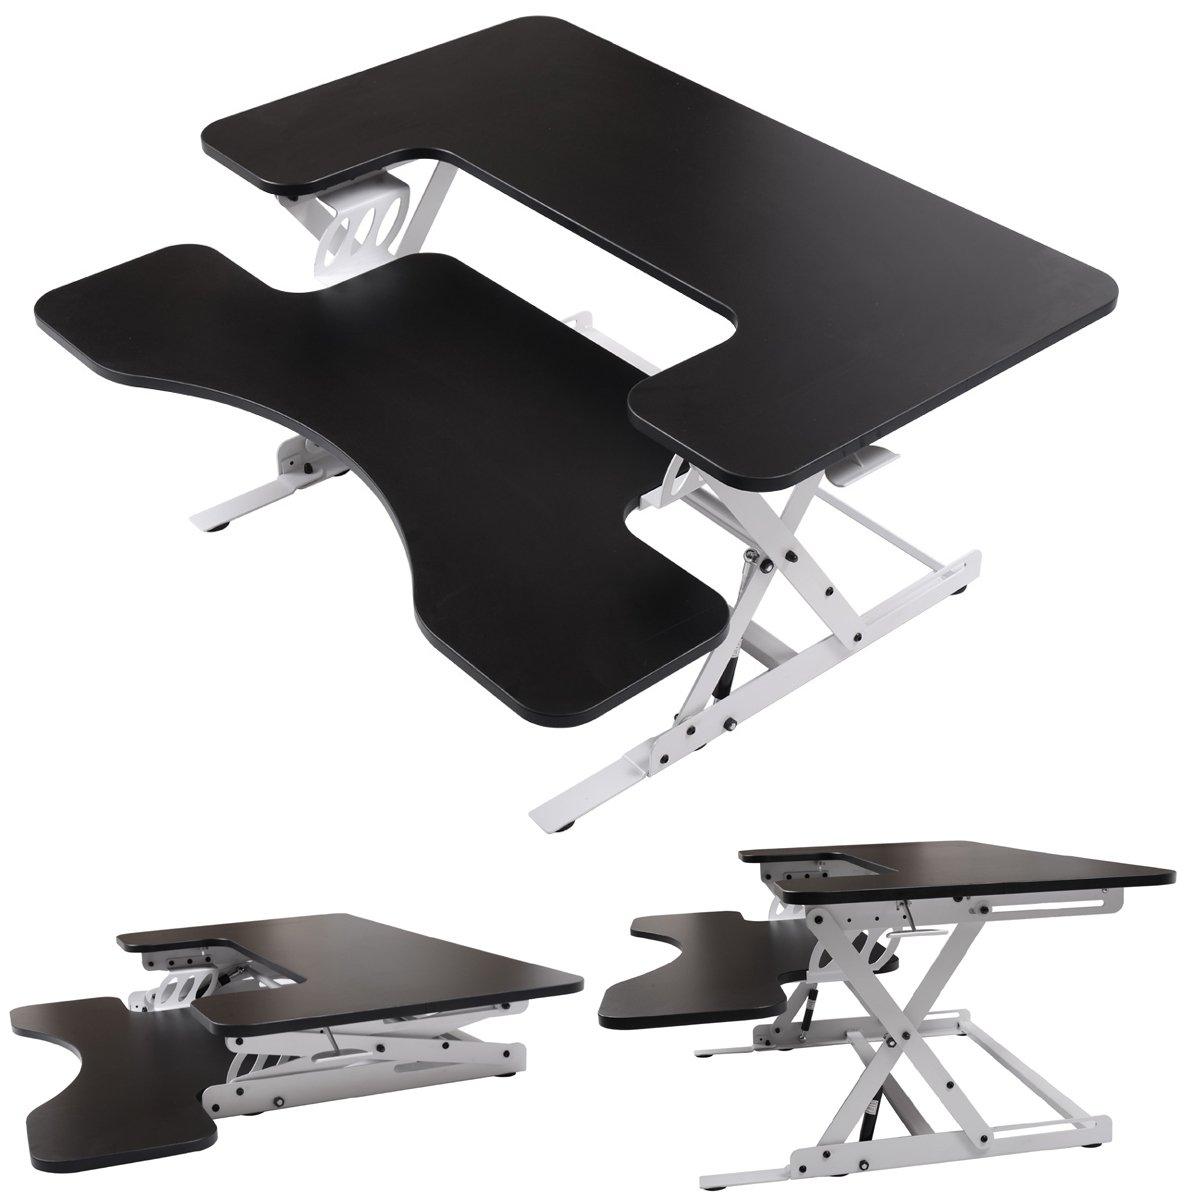 LAZYMOON Ergonomic 36'' Wide Preassembled Height Adjustable Standing Desk Riser/Stand Workstation Elevating Desktop Removable Keyboard Tray, Black & White